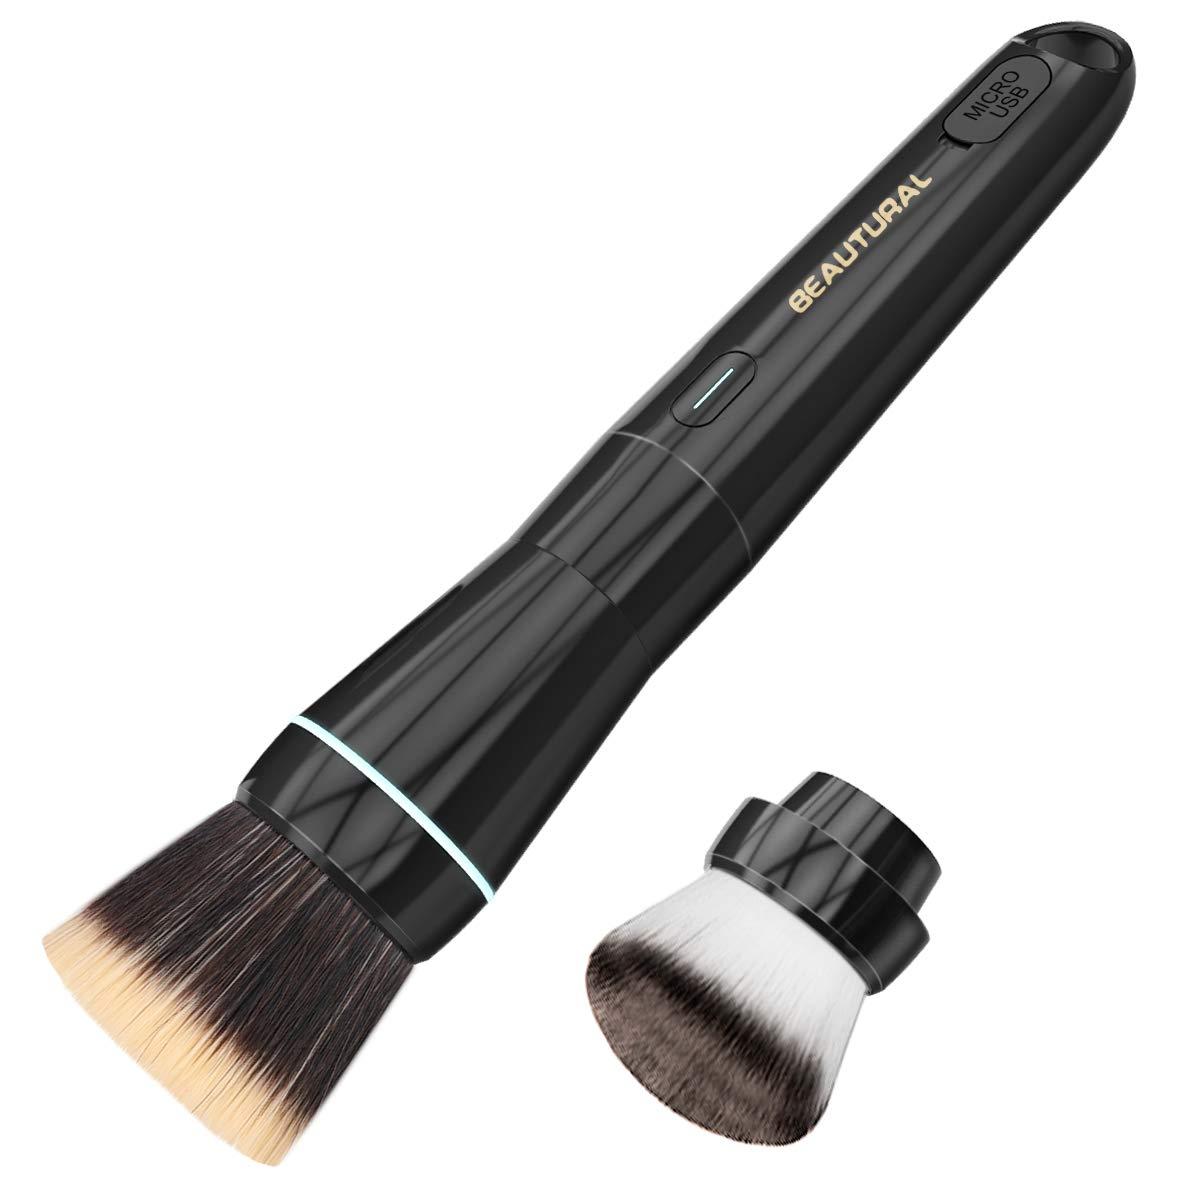 Beautural Electric Makeup Brush Set, Rechargeable Rotation Automatic Blending Cosmetics Blushes Kit for Liquid Foundation Face Powder Contour Bronzer Concealer BB Cream, Black 6-10200001